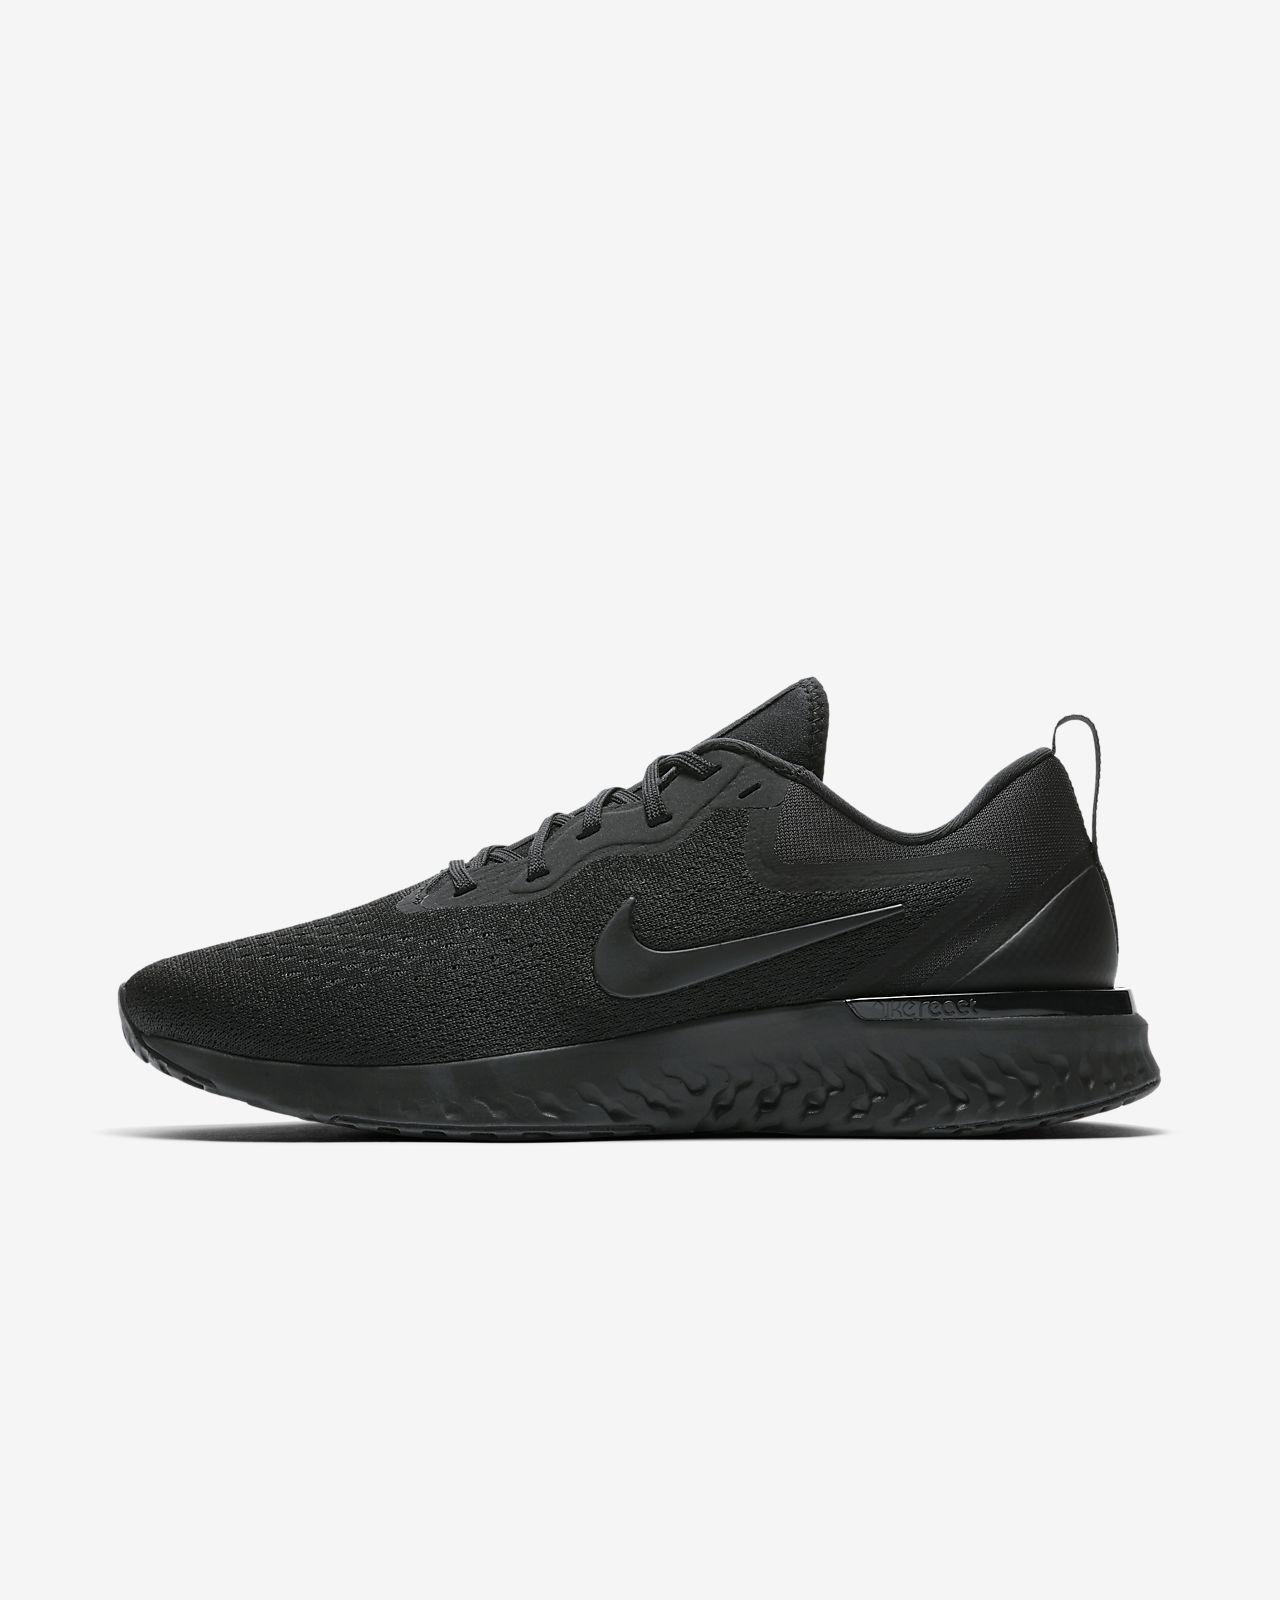 Nike Odyssey React Herren-Laufschuh - 59e41e - ernst-beck.de 8db215baec